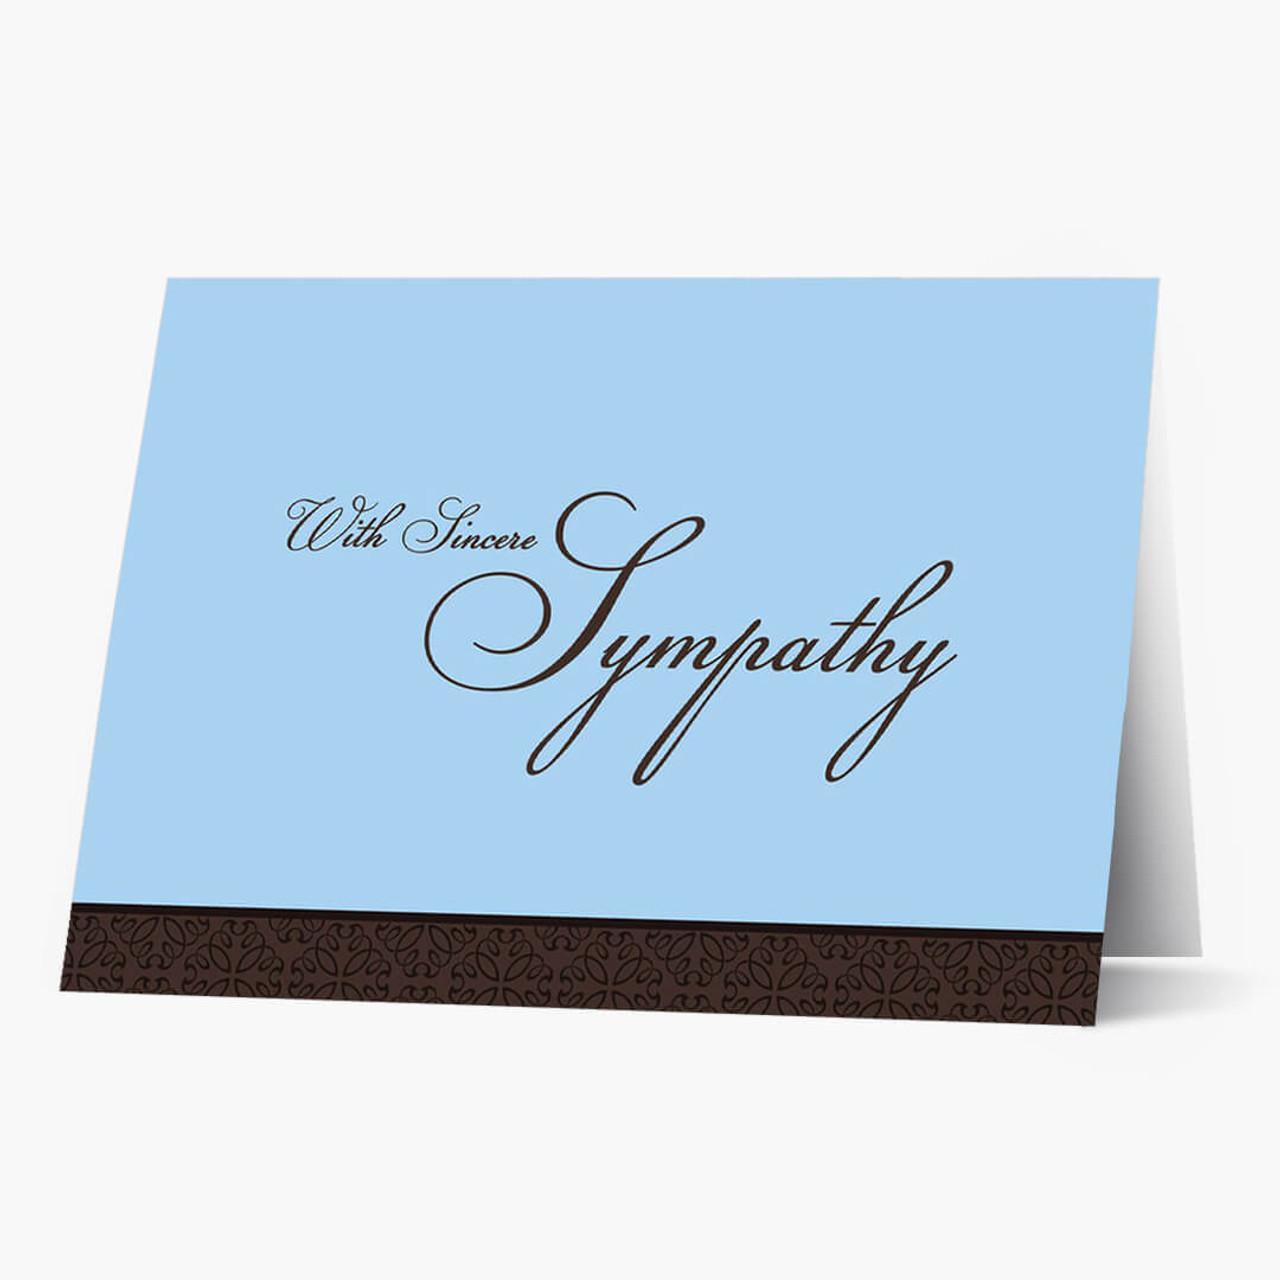 Sincere Expression Sympathy Card